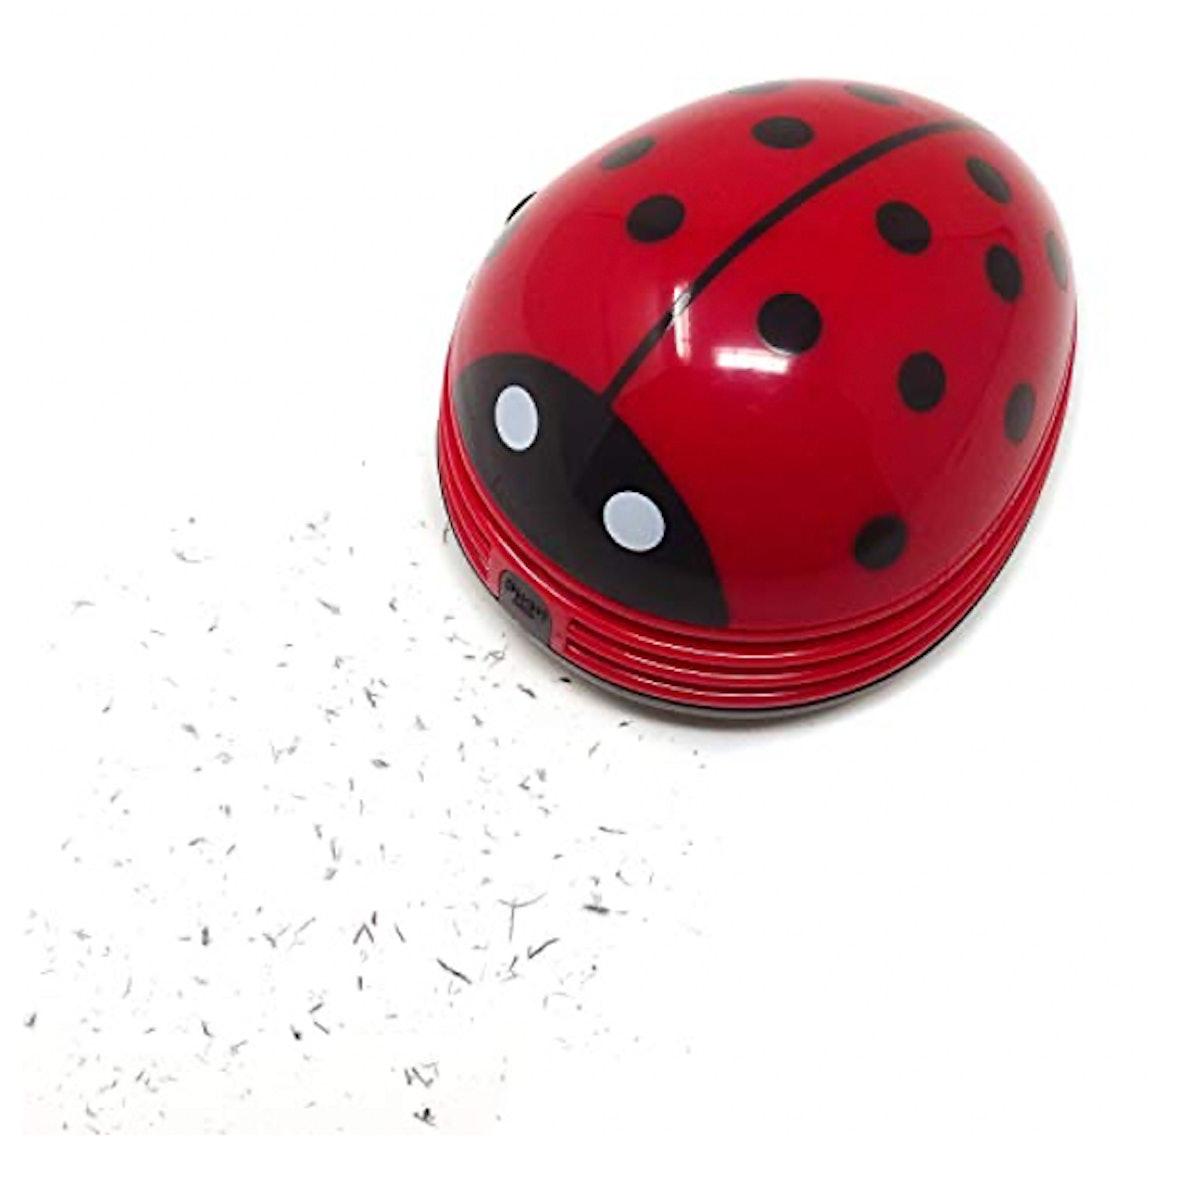 Honbay Ladybug Desk Vacuum